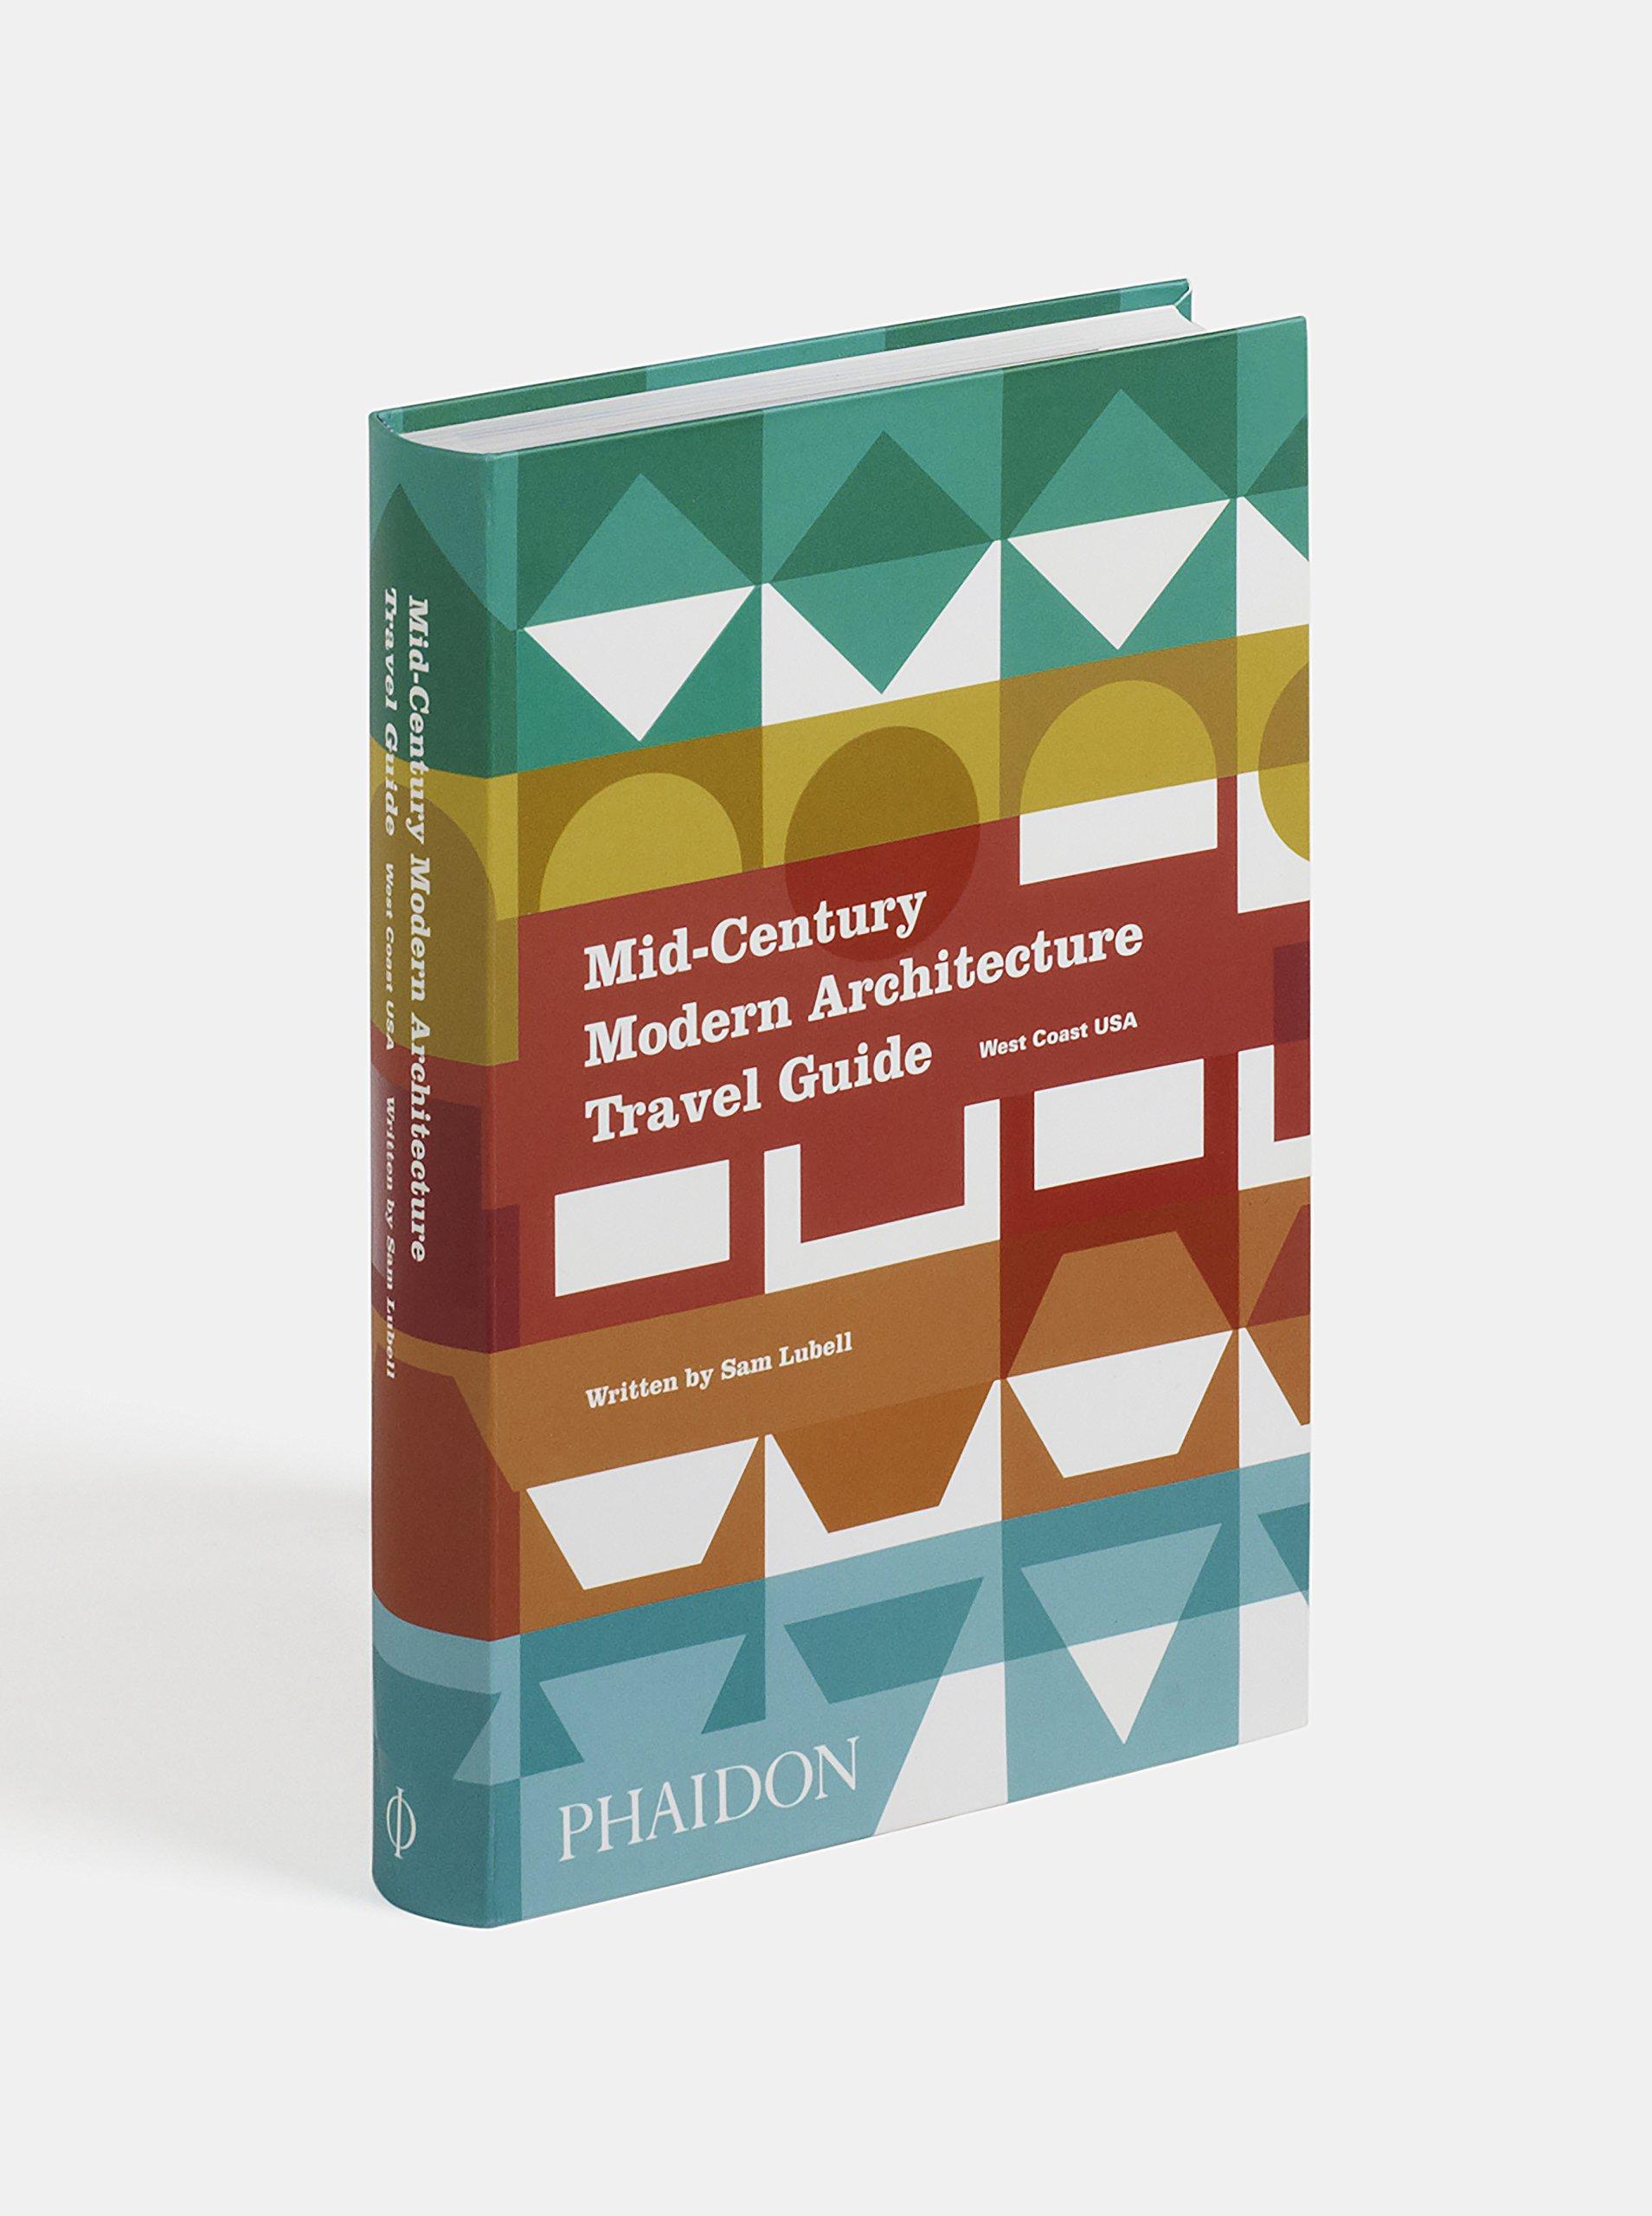 Mid-Century Modern Architecture Travel Guide. West Coast USA: Amazon.es: Sam Lubell: Libros en idiomas extranjeros